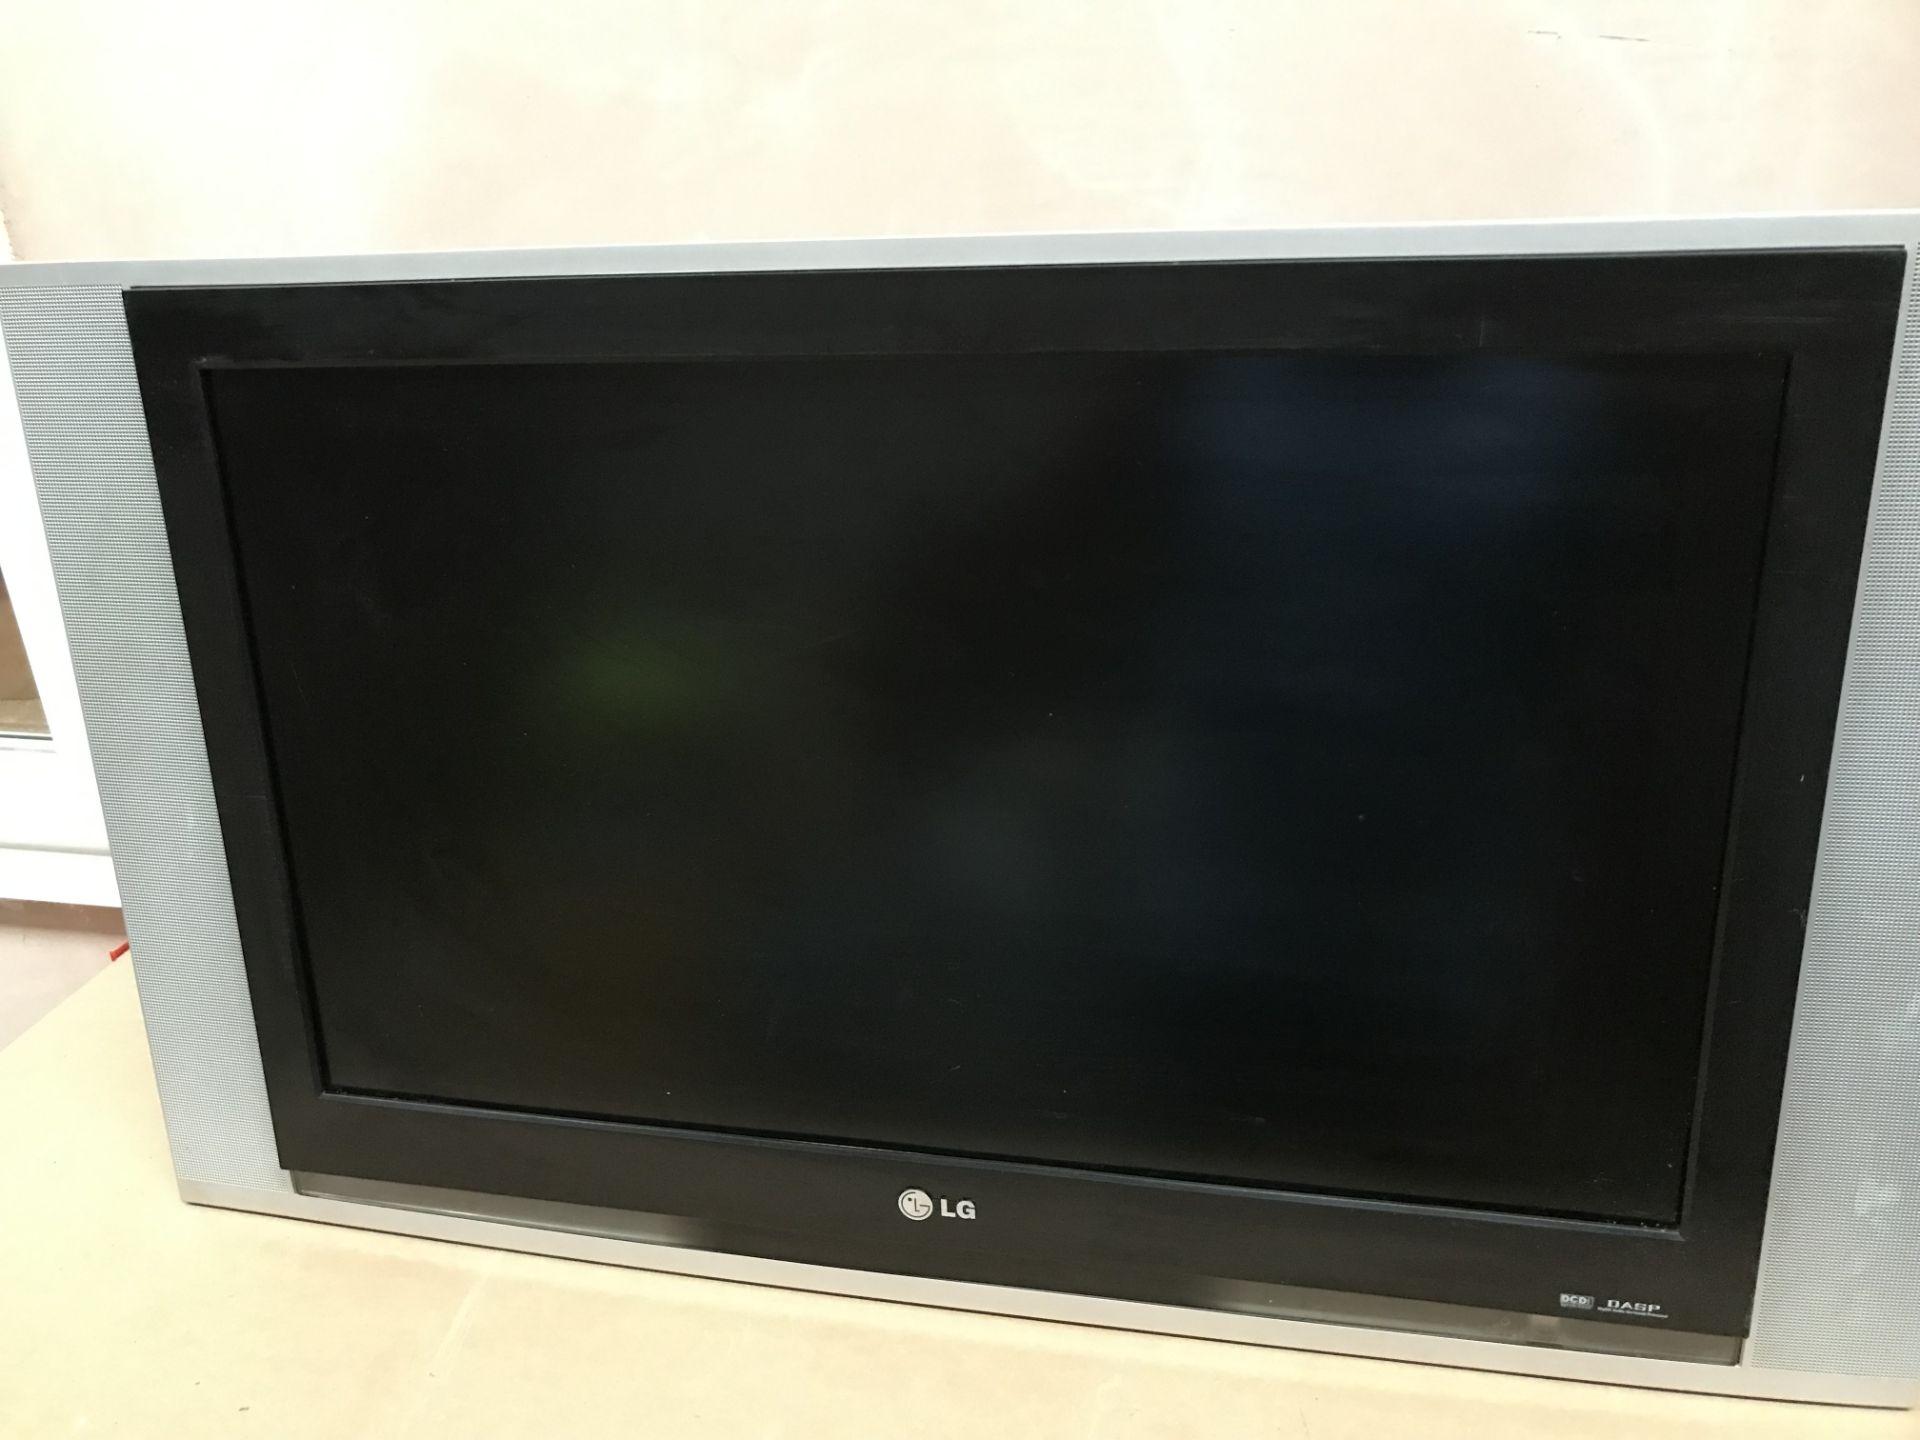 Lot 24 - LG - LCD TV